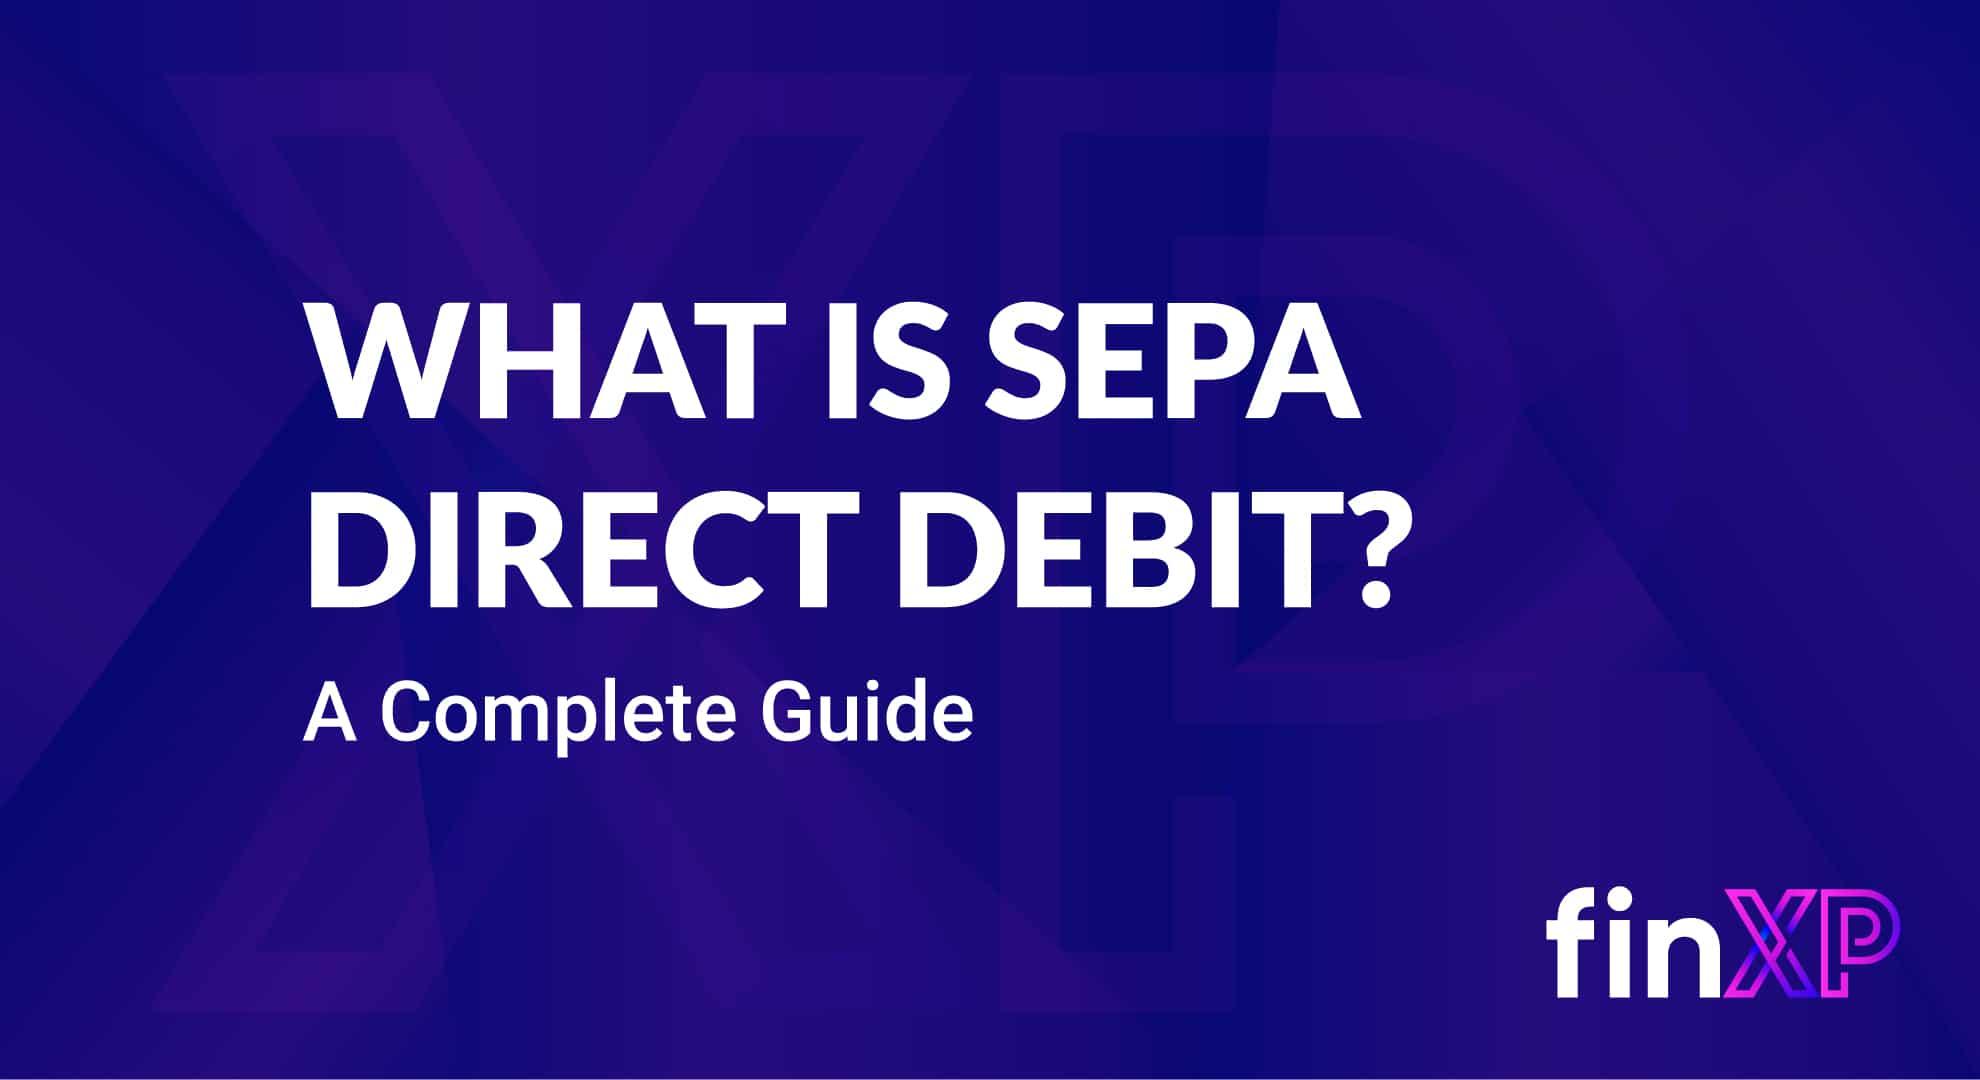 What is SEPA Direct Debit? image